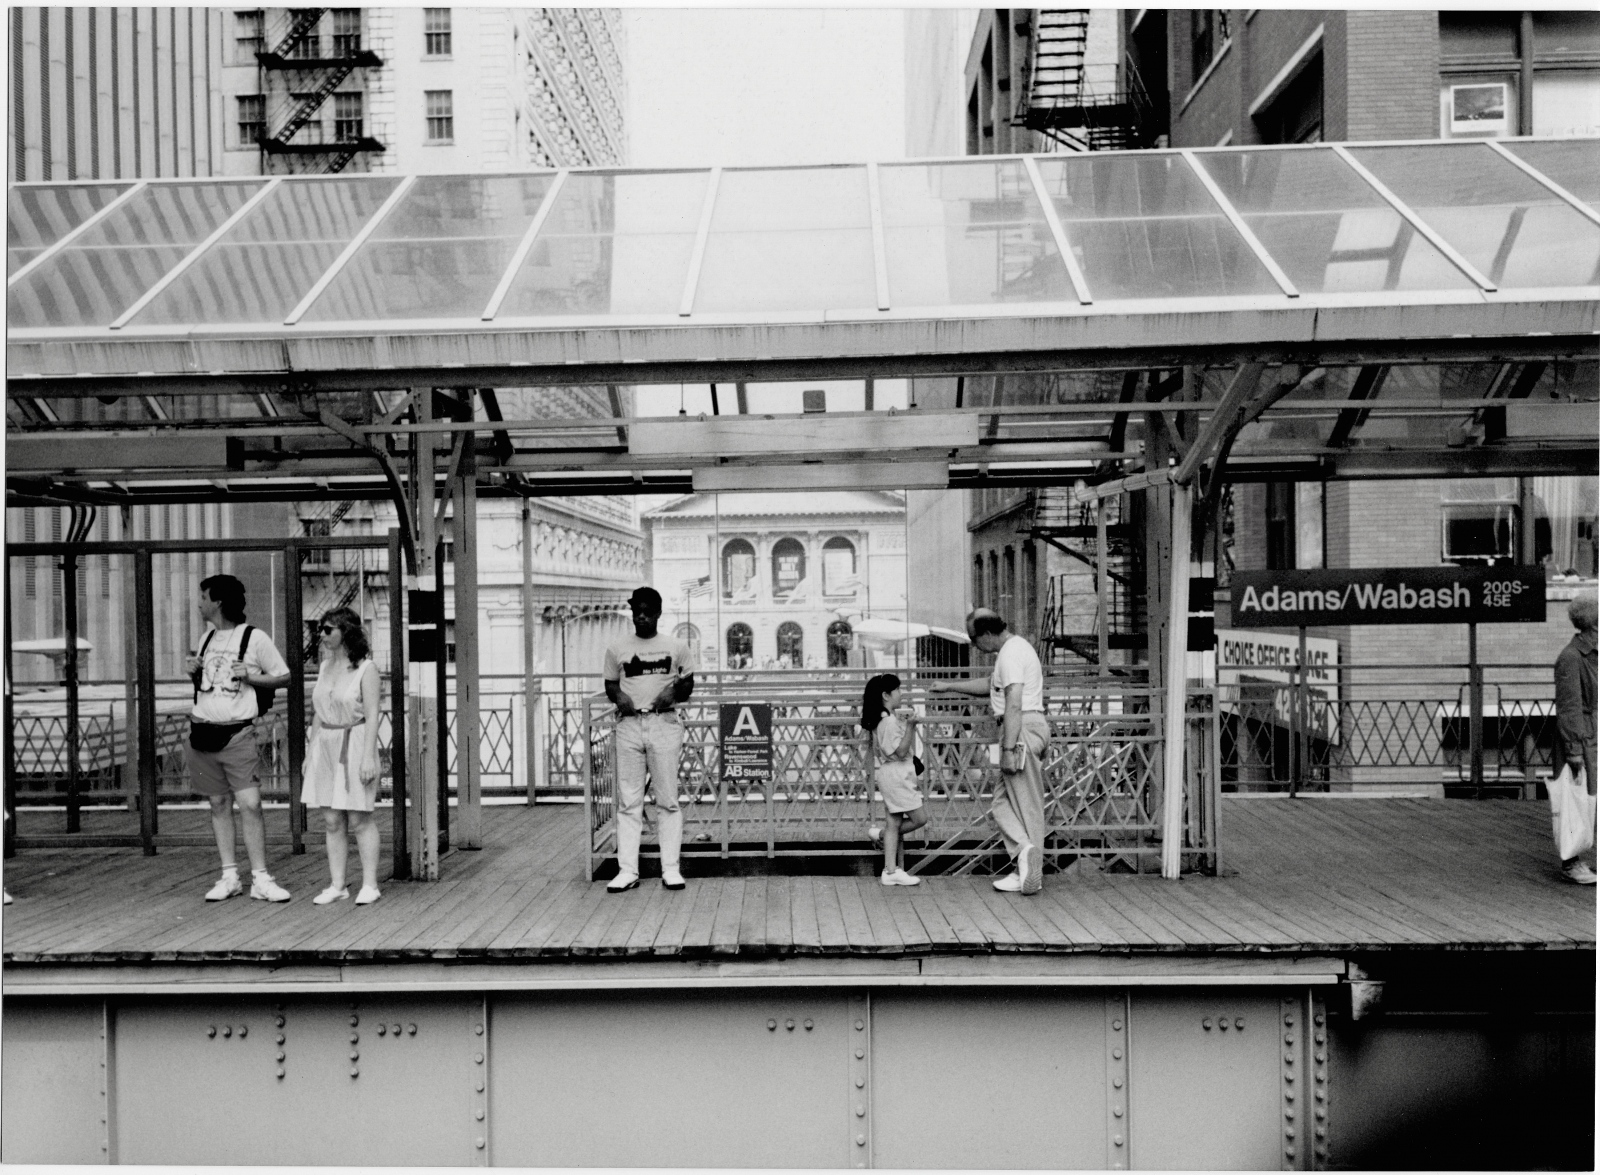 Art and Documentary Photography - Loading Trainplatform_copy.jpg